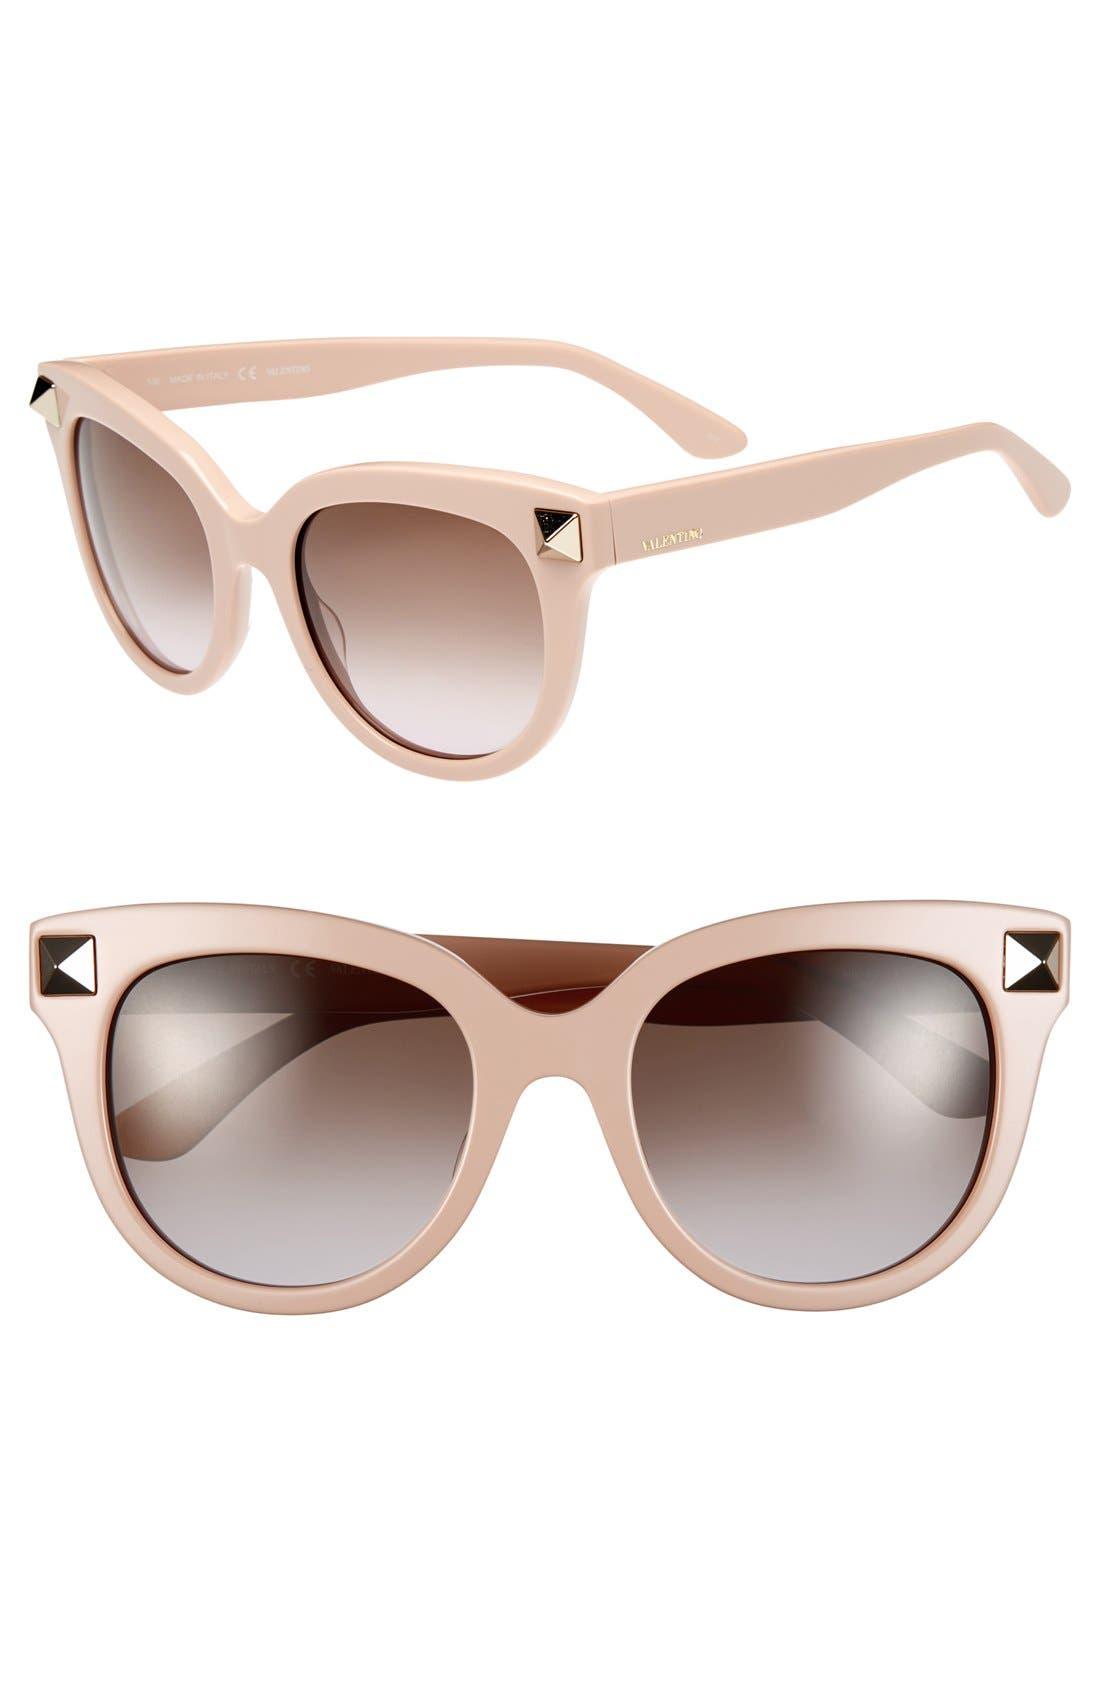 Main Image - Valentino 'Rockstud' 52mm Studded Sunglasses